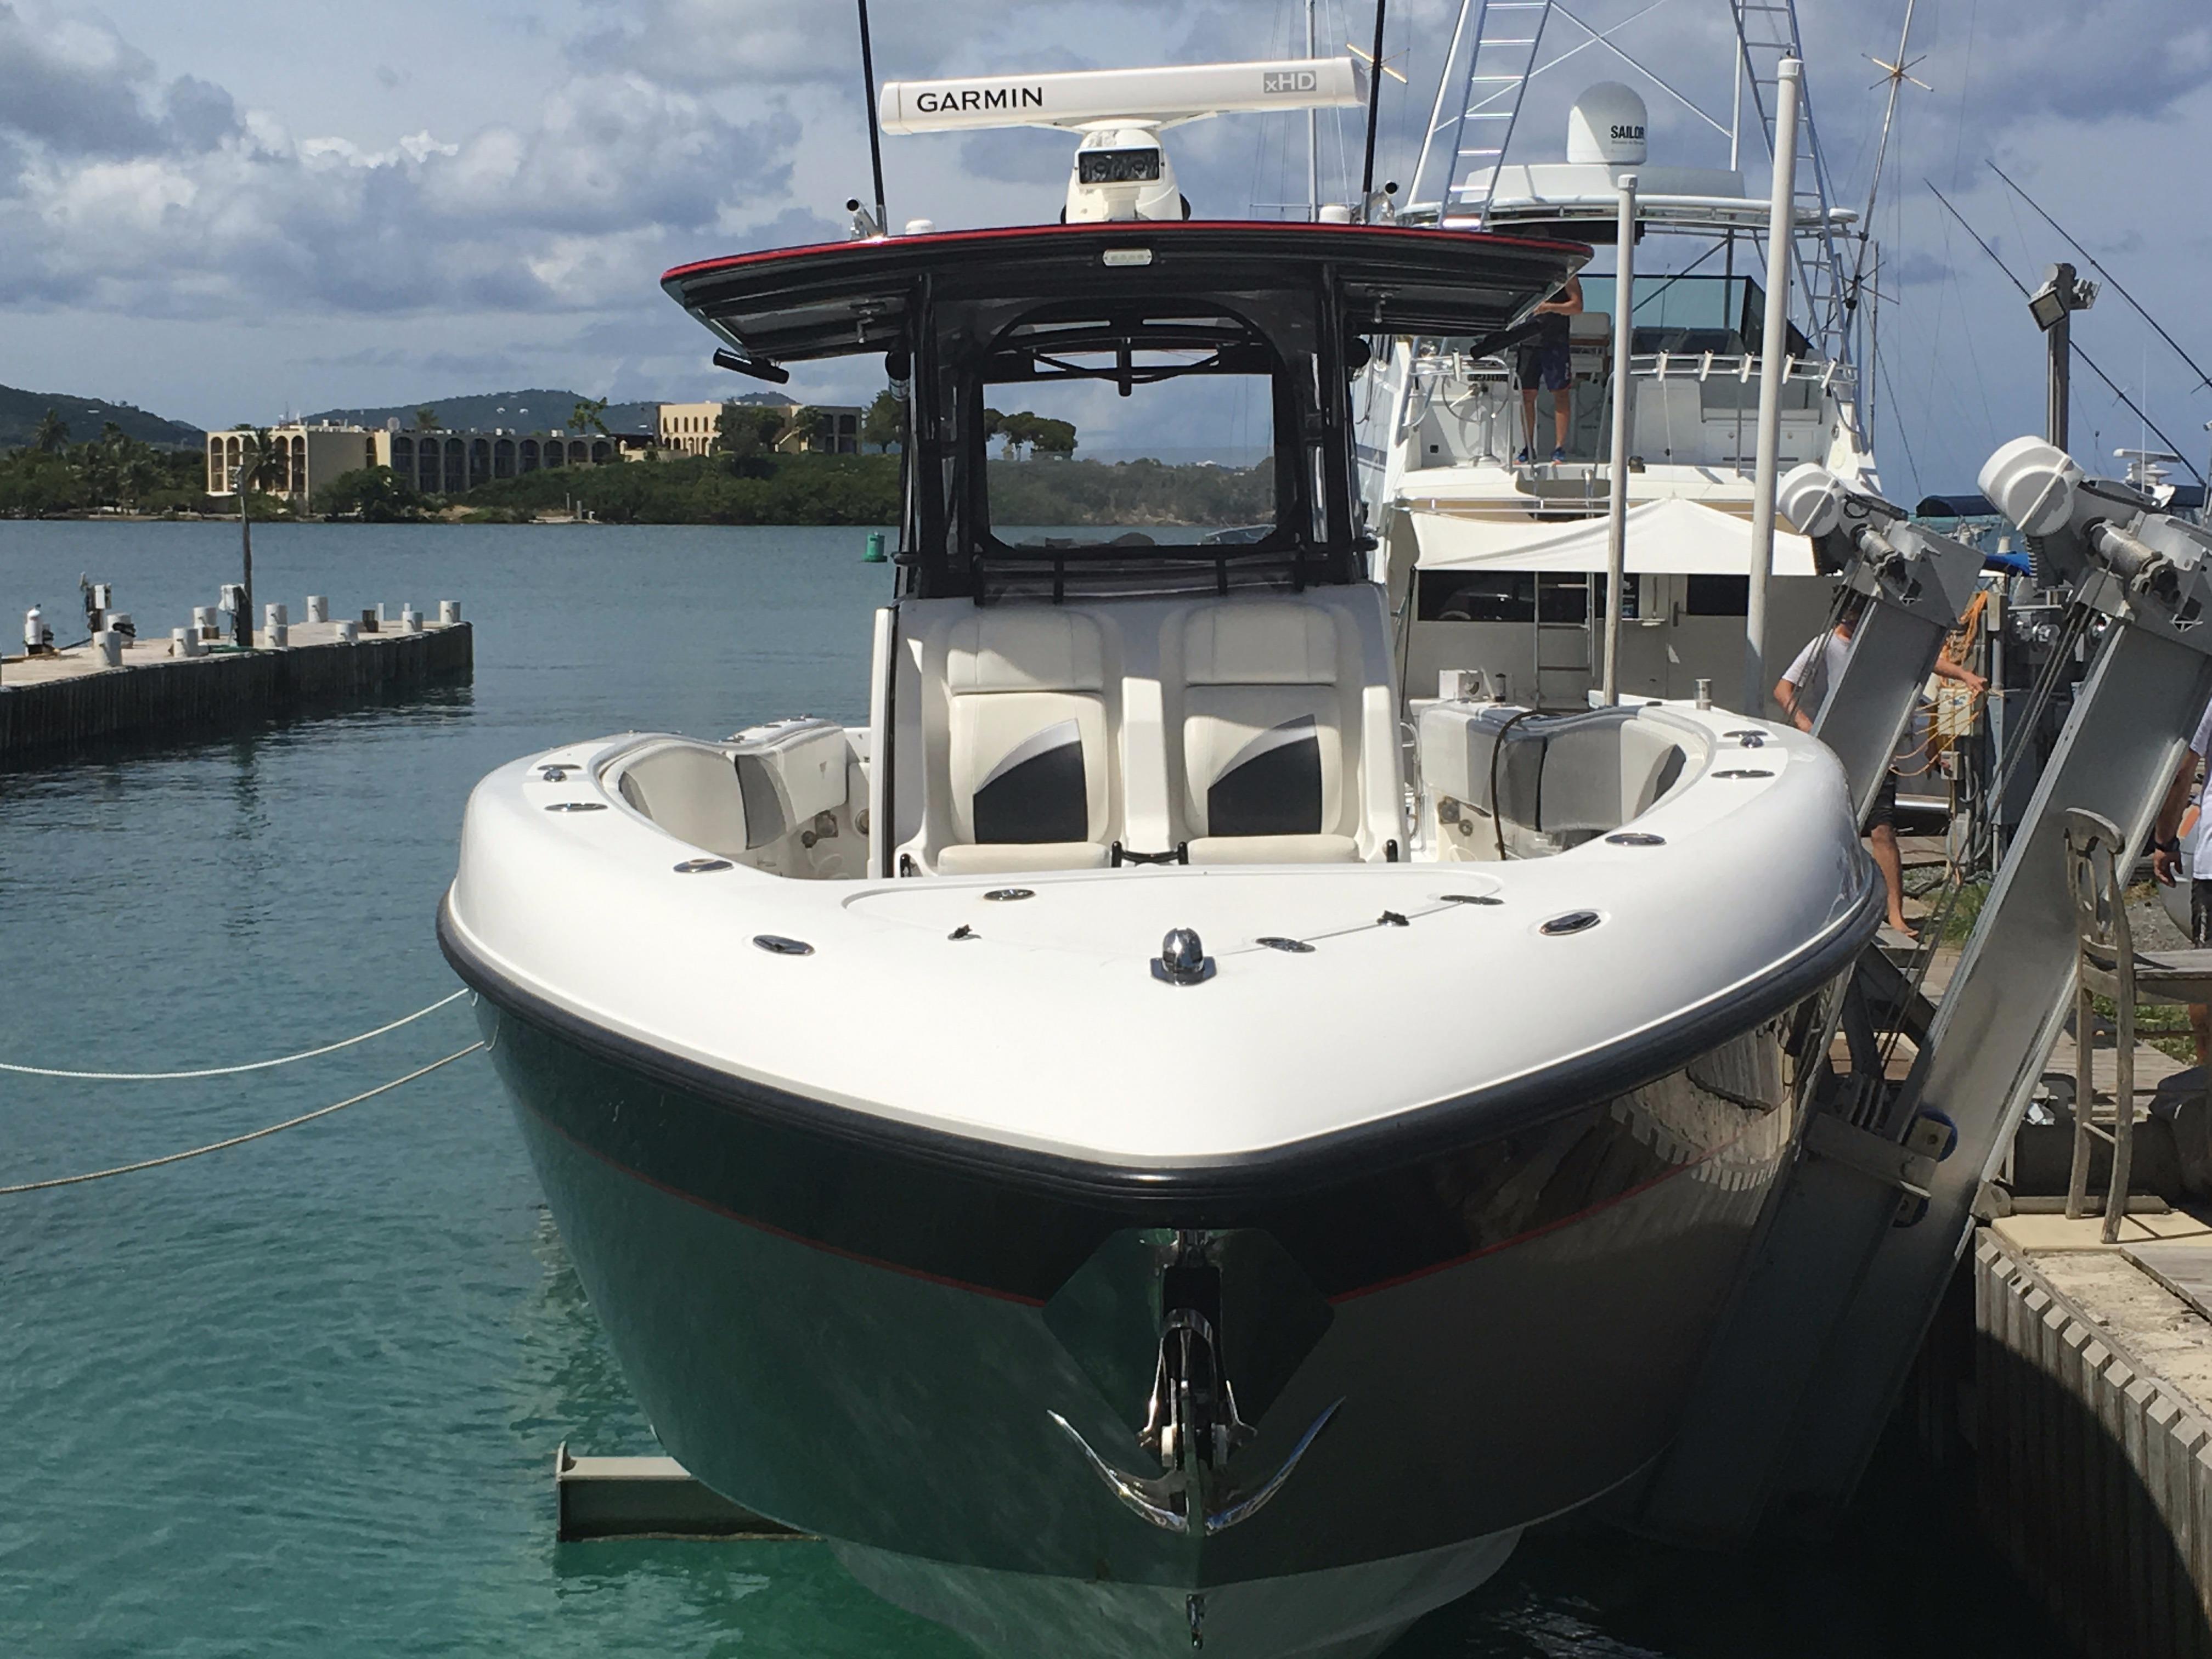 2012 Deep Impact 399 Open Yacht for Sale in St Croix US Virgin